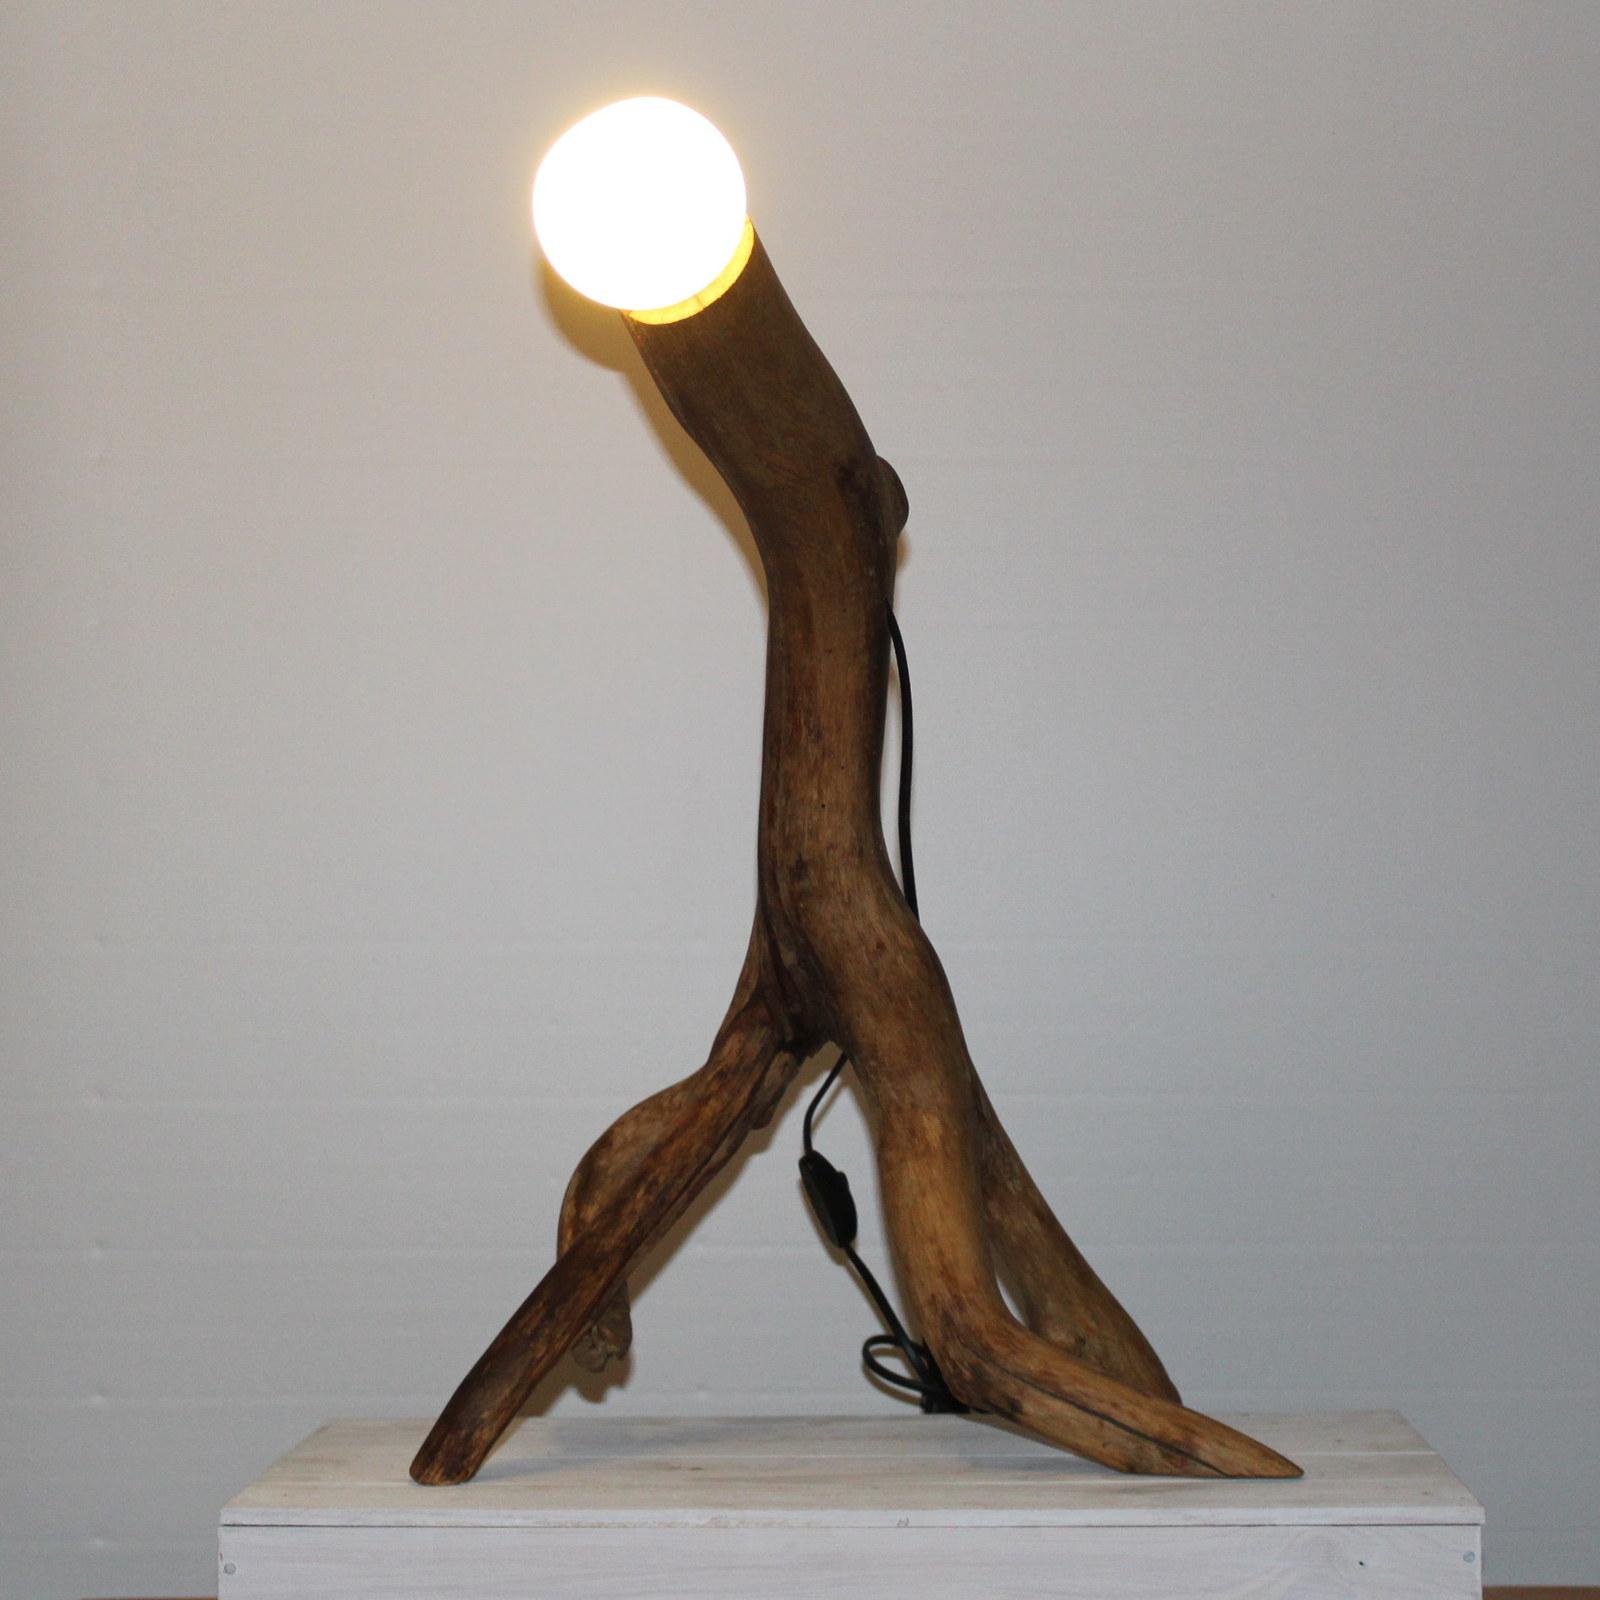 Skurile Holzdekoration mit Lampe.